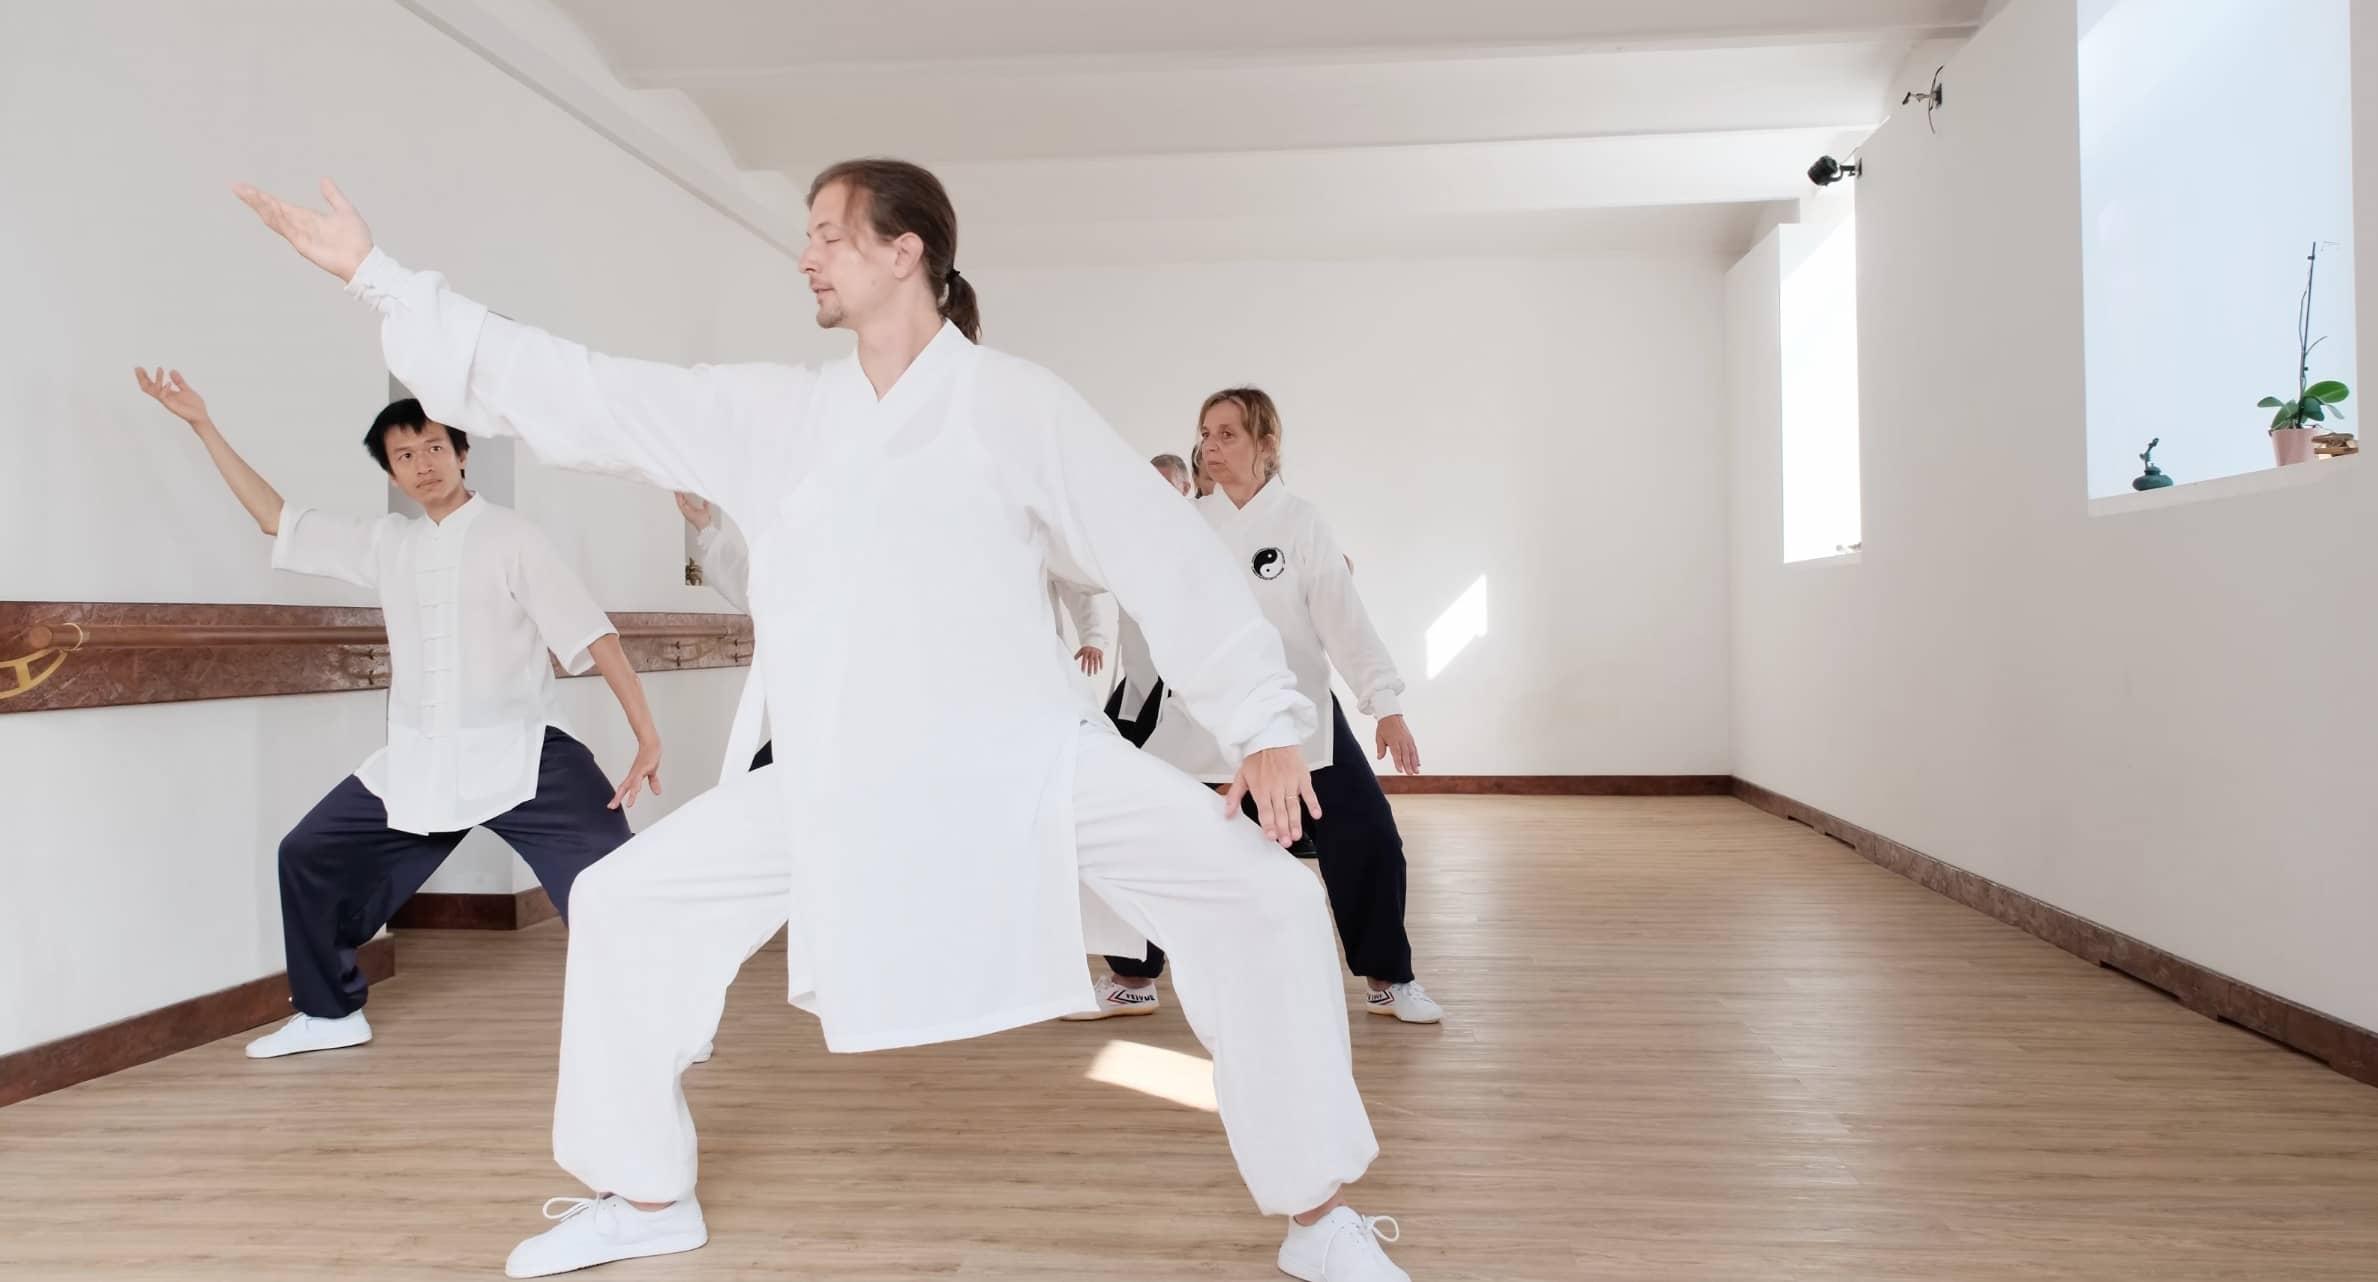 Taiji 13 – Brushing Over The Knee & Shoulder Push – Part 9